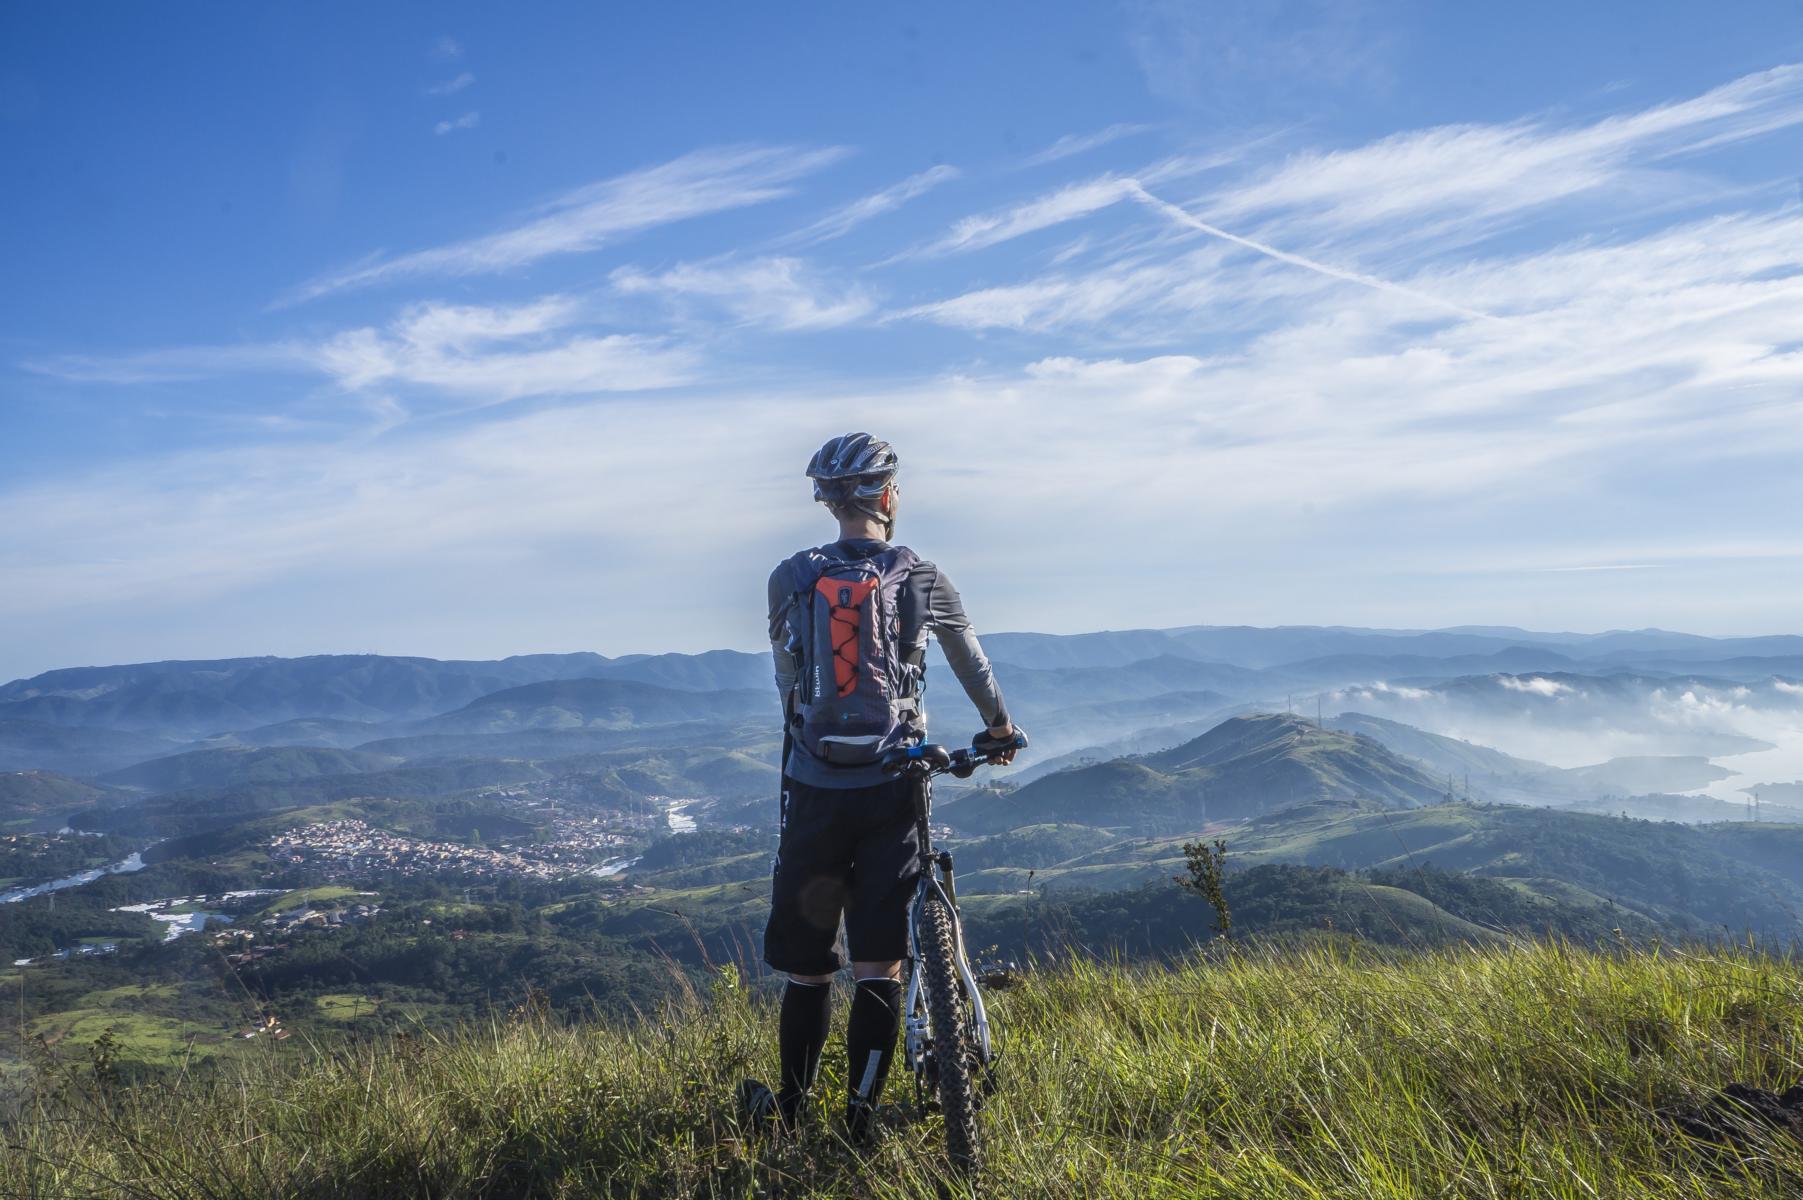 Fahrrad E Bike Mountainbike Urlaub